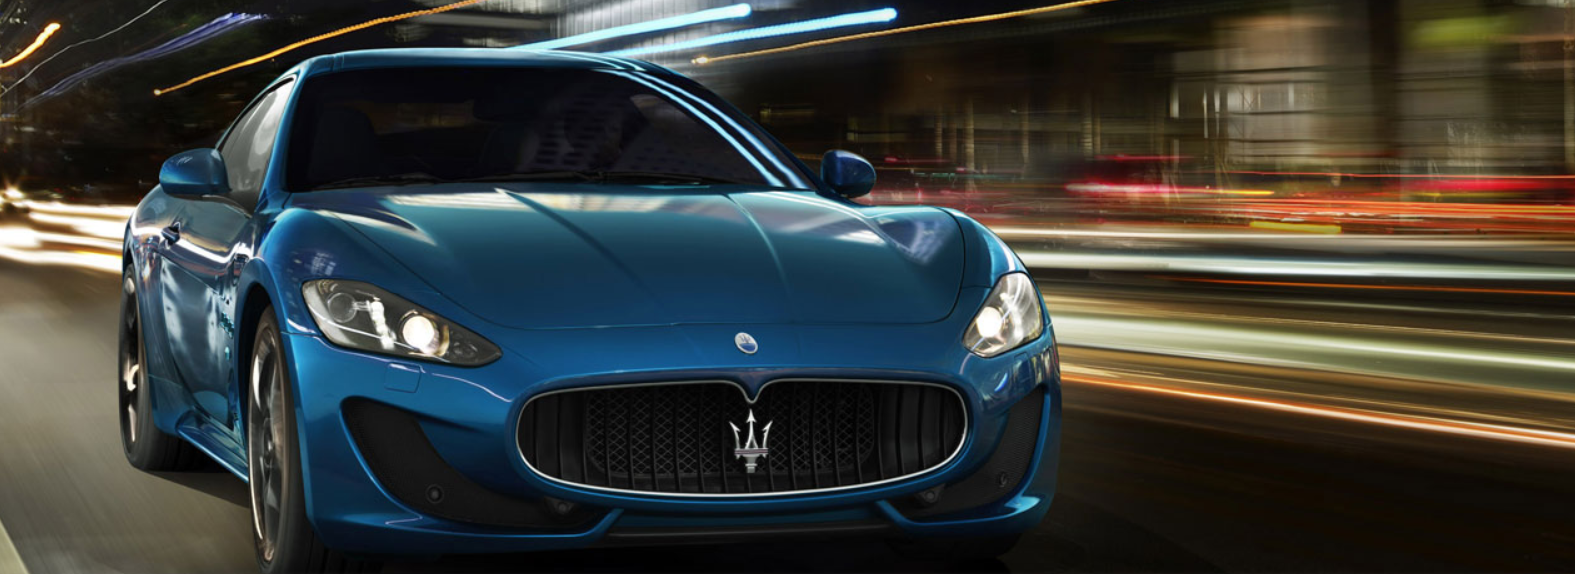 Maserati_GranTurismo_Sport-ดุดัน